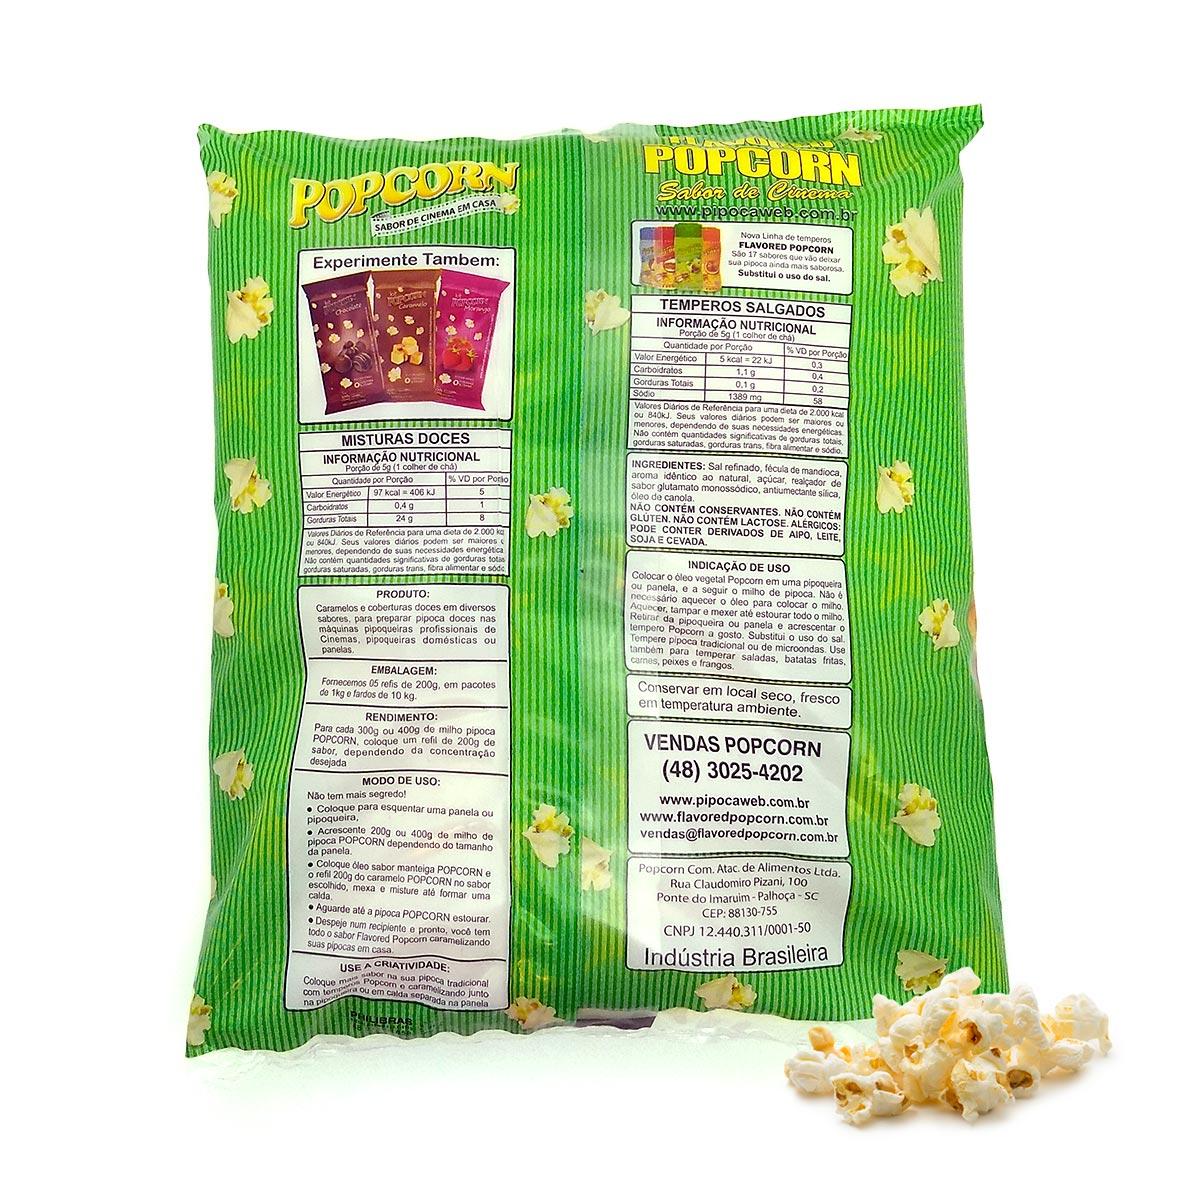 Sabores p/ caramelizar Pipoca Doce - Banana c/ Canela - Pct 1kg